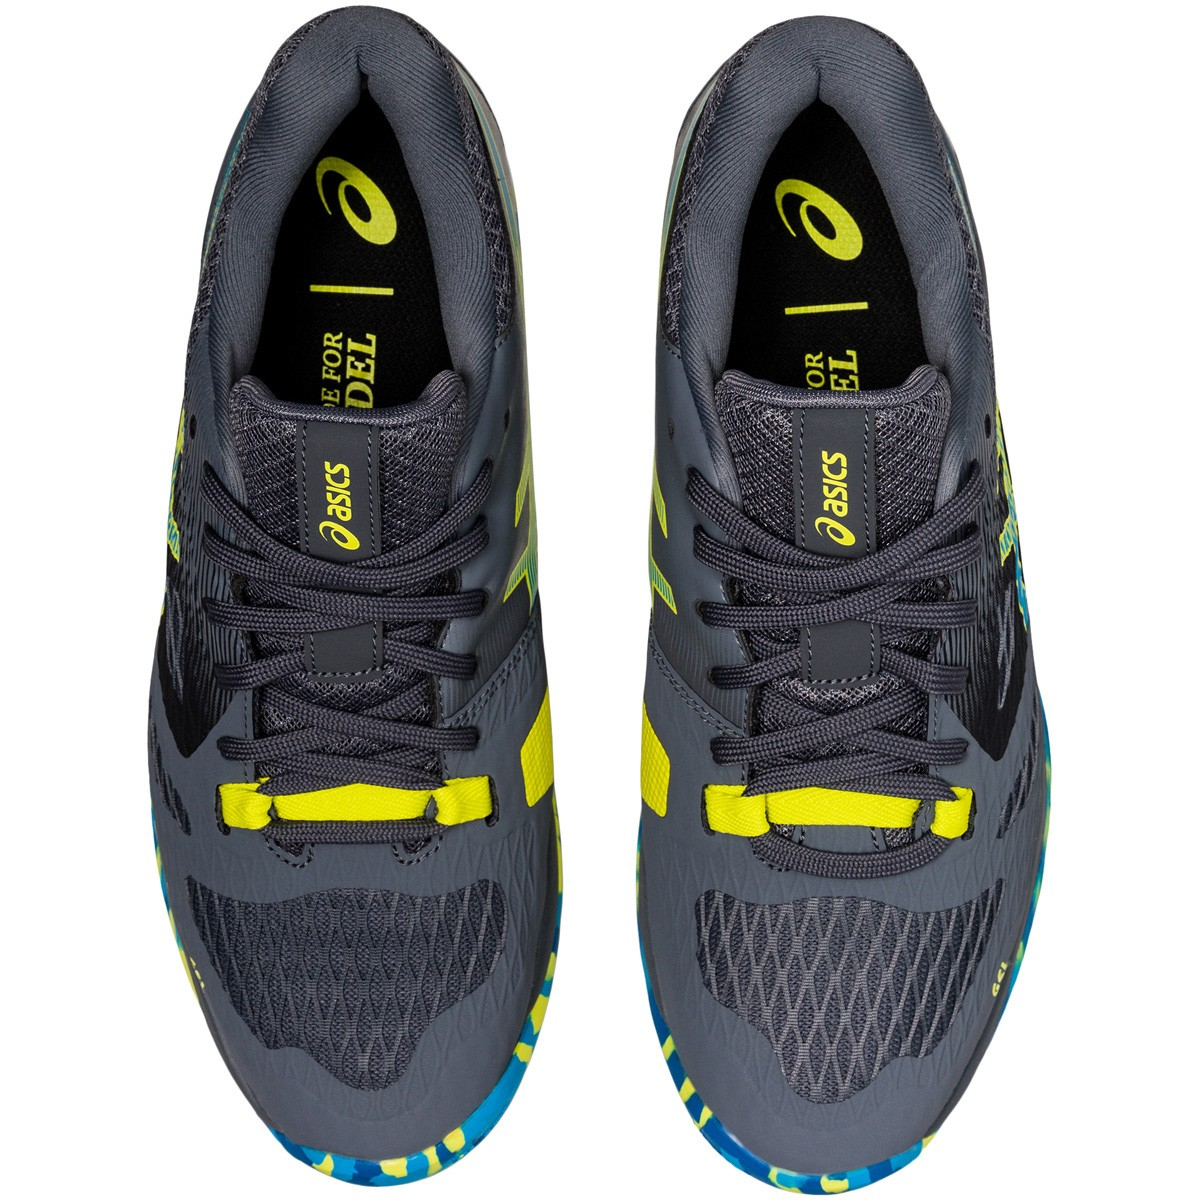 ASICS LIMA FF PADEL/CLAY COURT SHOES - ASICS - Shoes - Padel ...